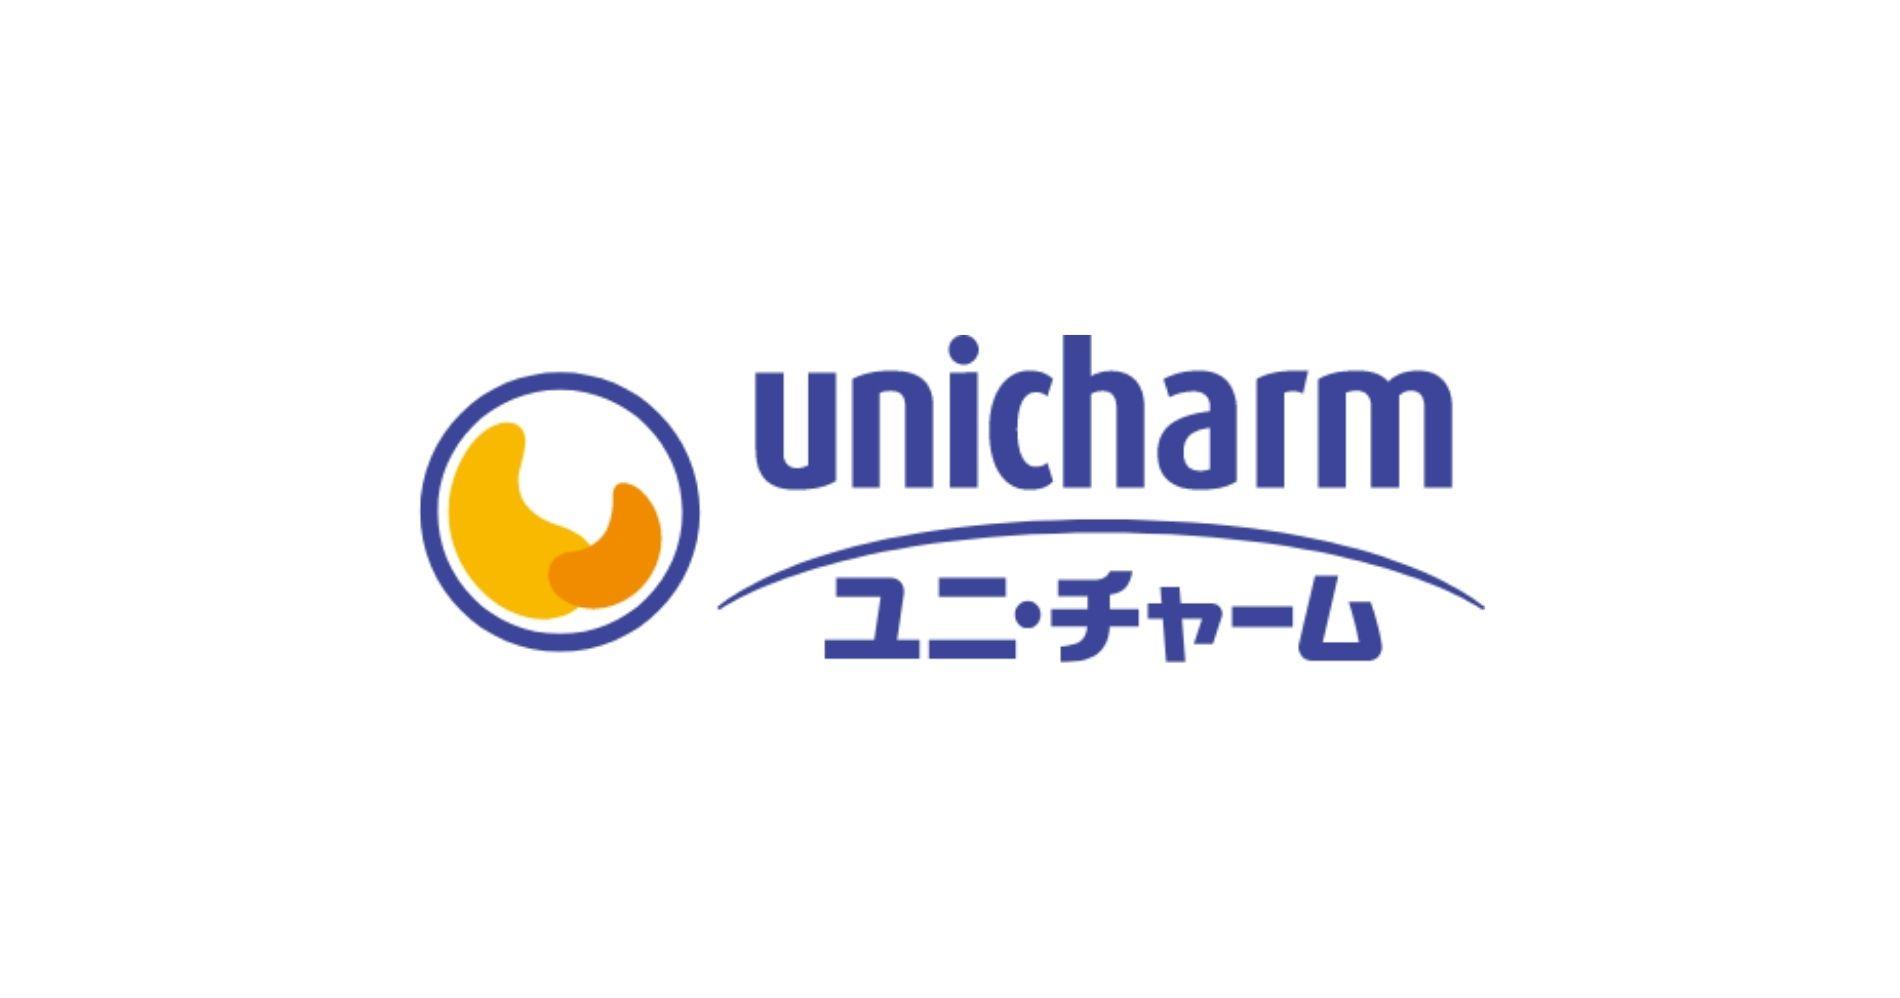 Unicharm Logo Illustration Web Bisnis Muda - Google